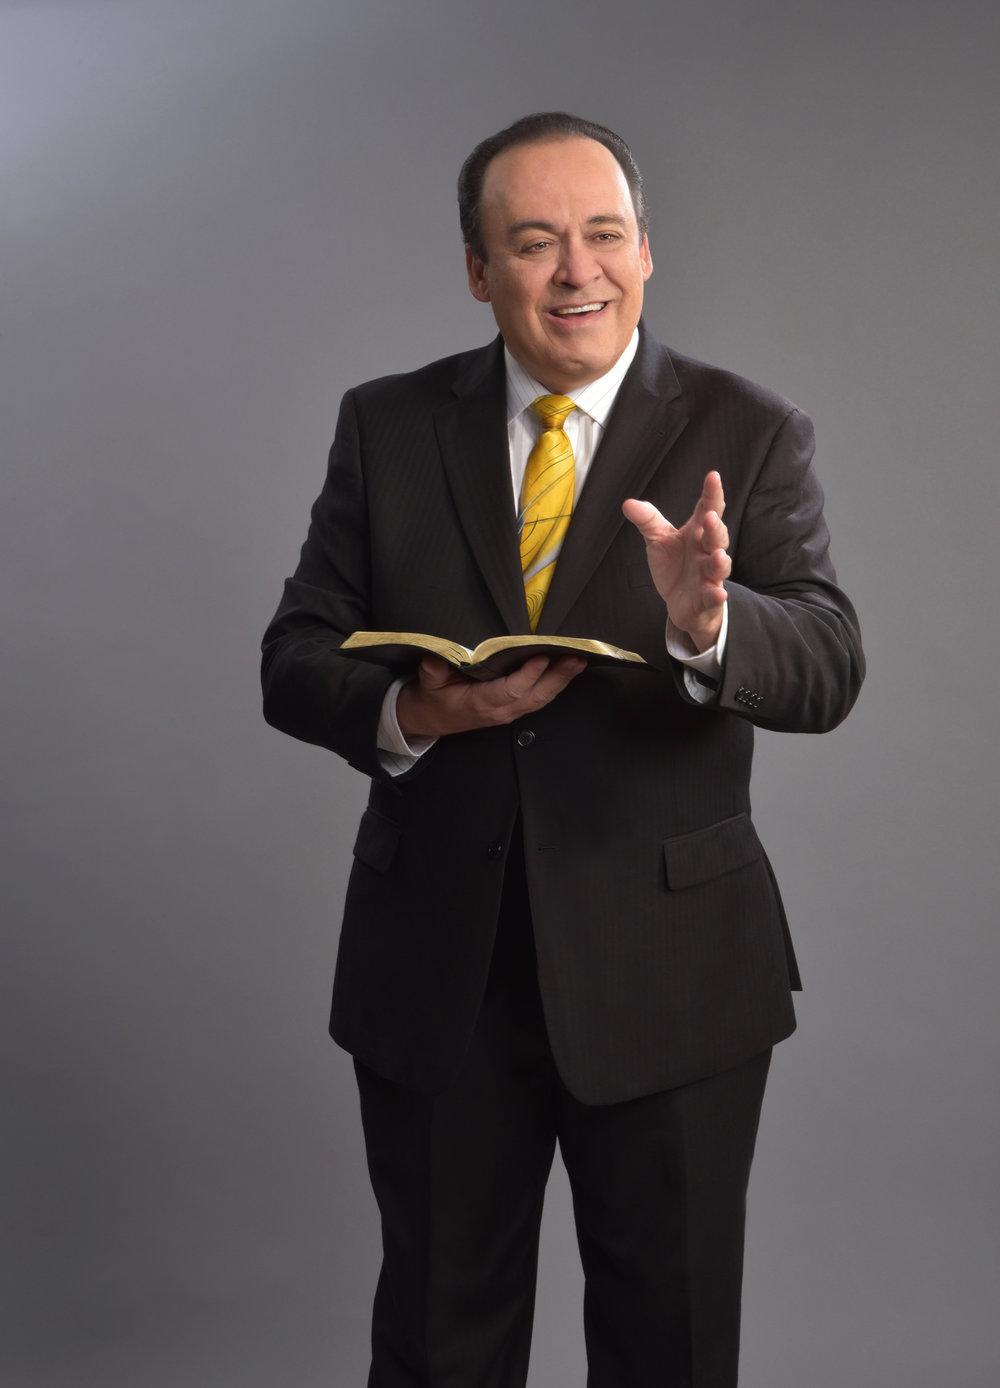 Omar Solo con Biblia 2.jpg